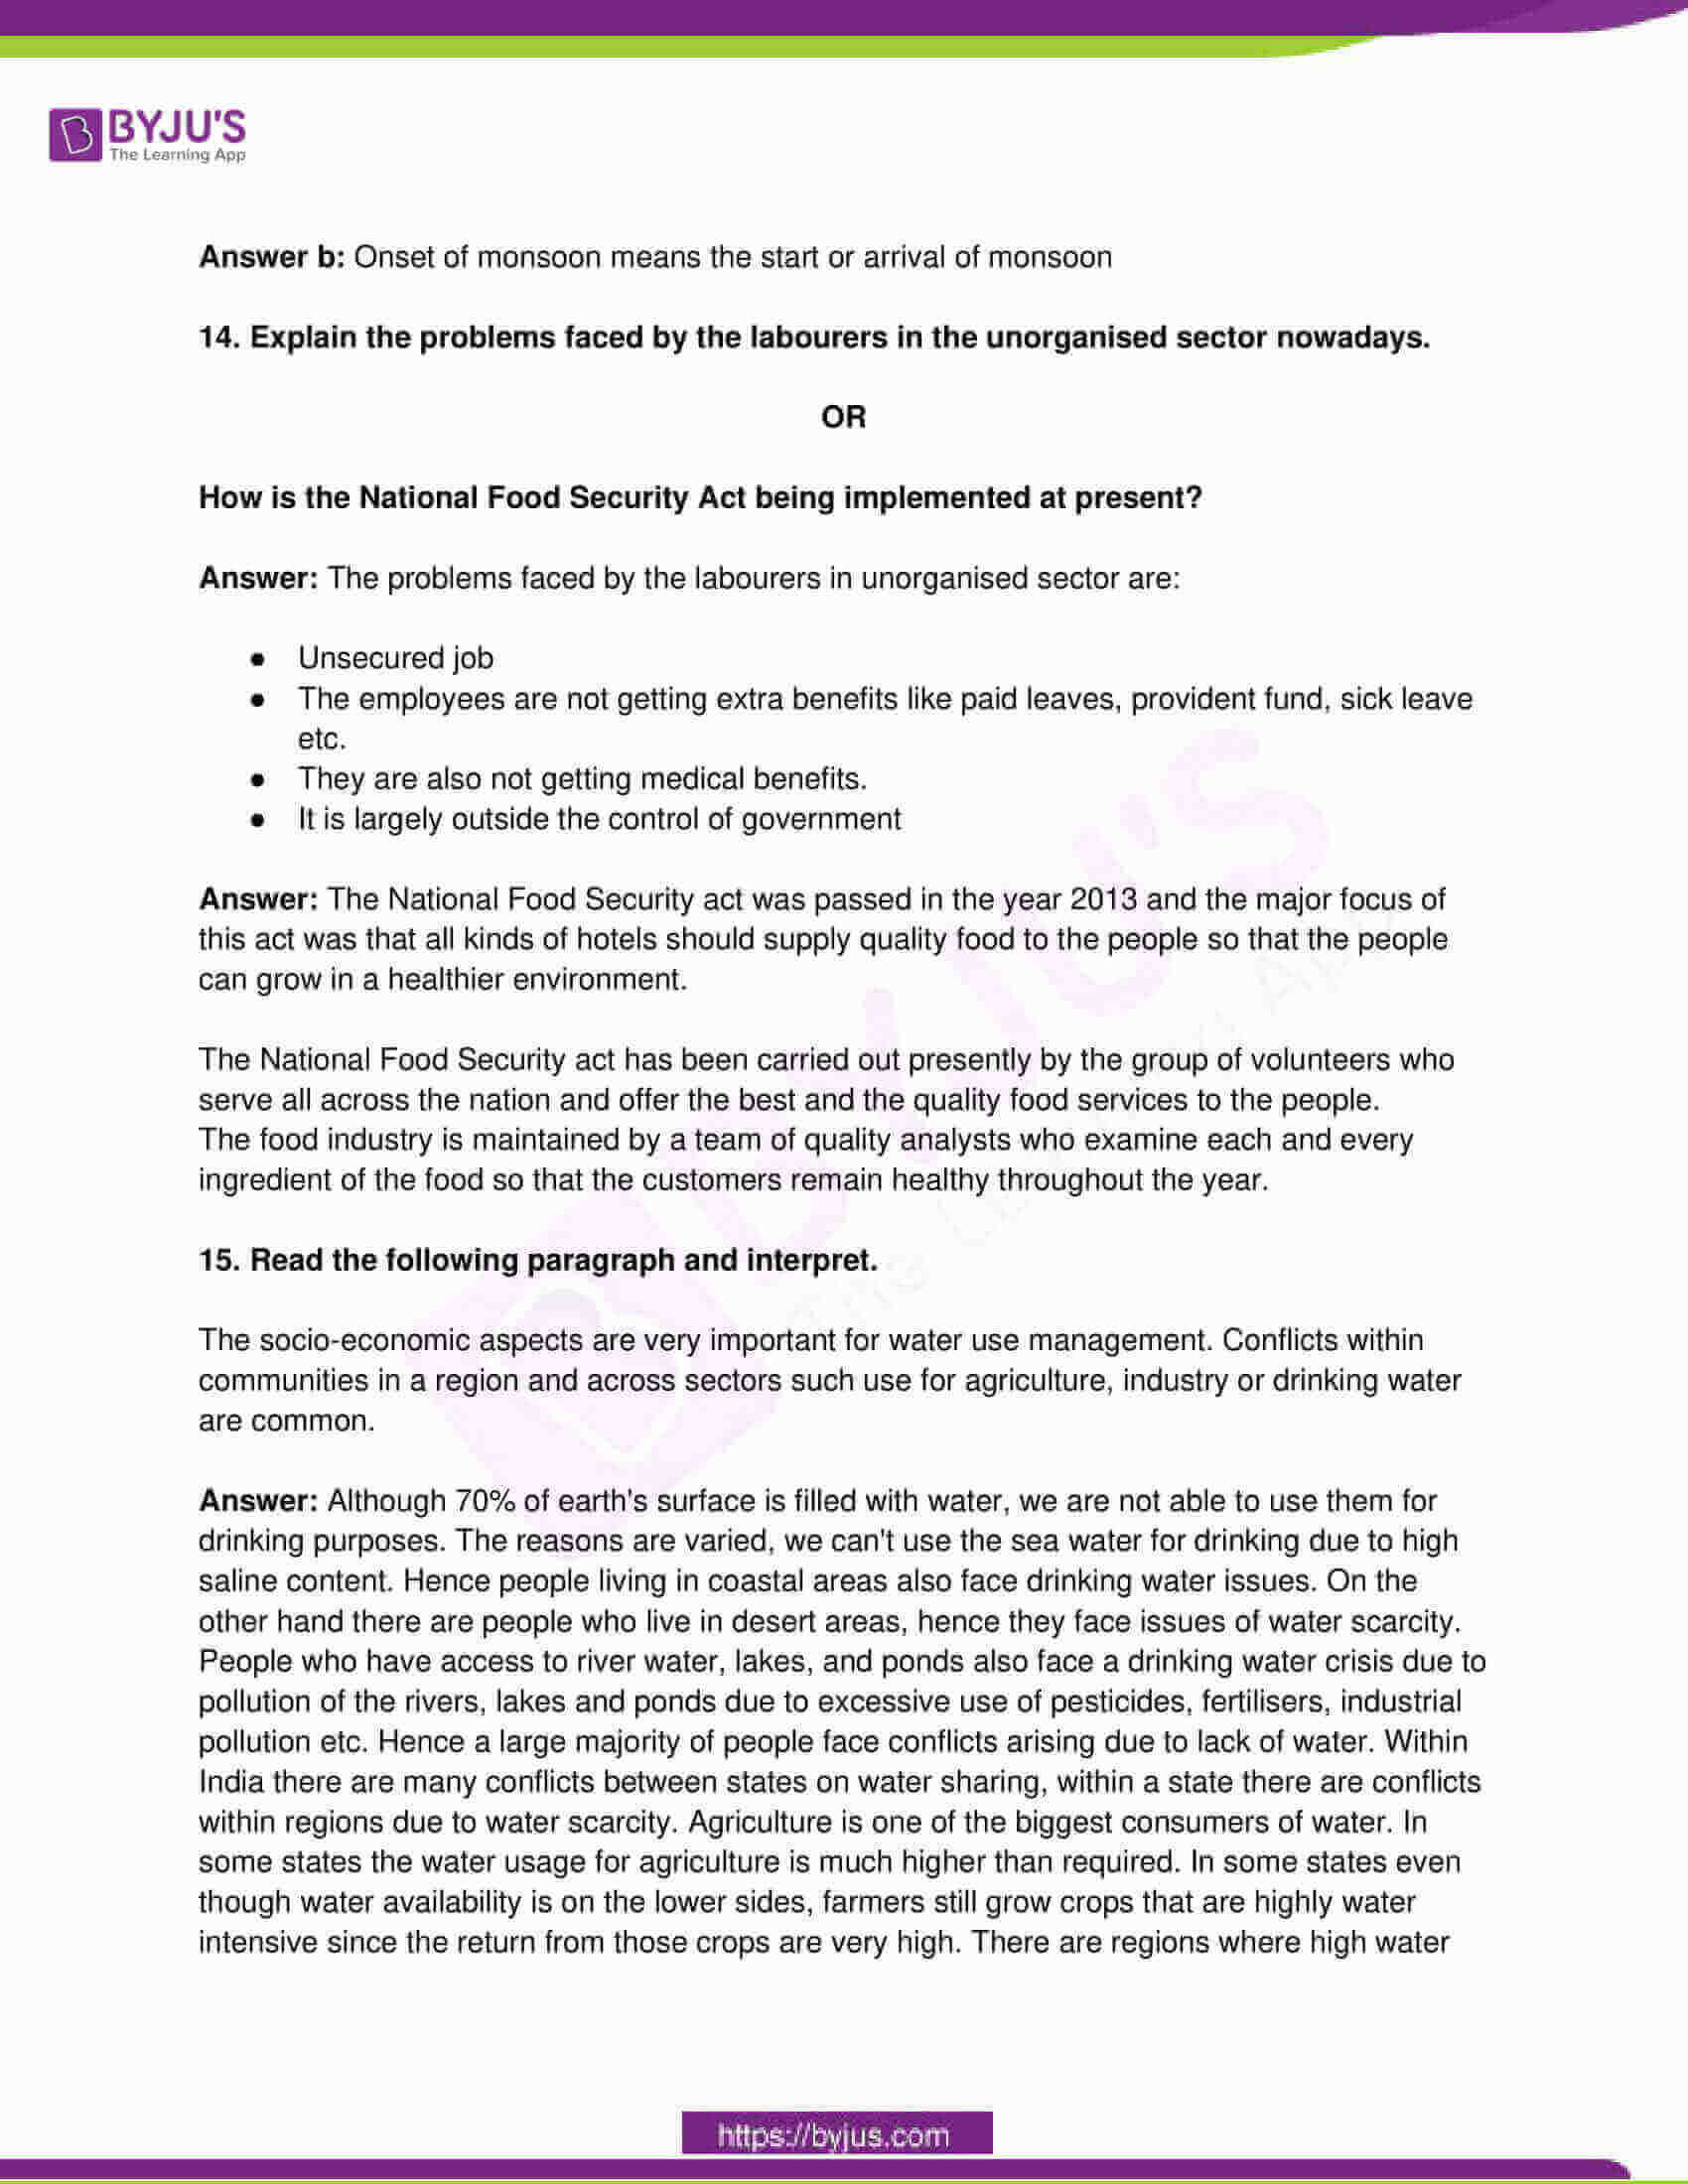 telangana board class 10 social science 2019 paper 1 solutions 5